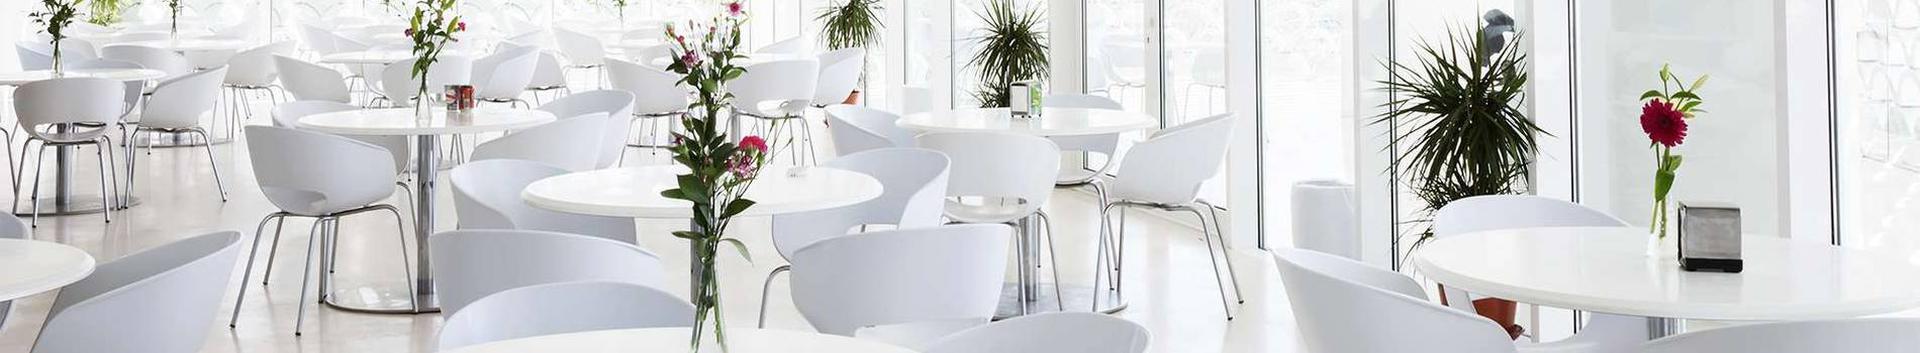 56101_toitlustus-restoran-jm-_75545825_xl.jpg